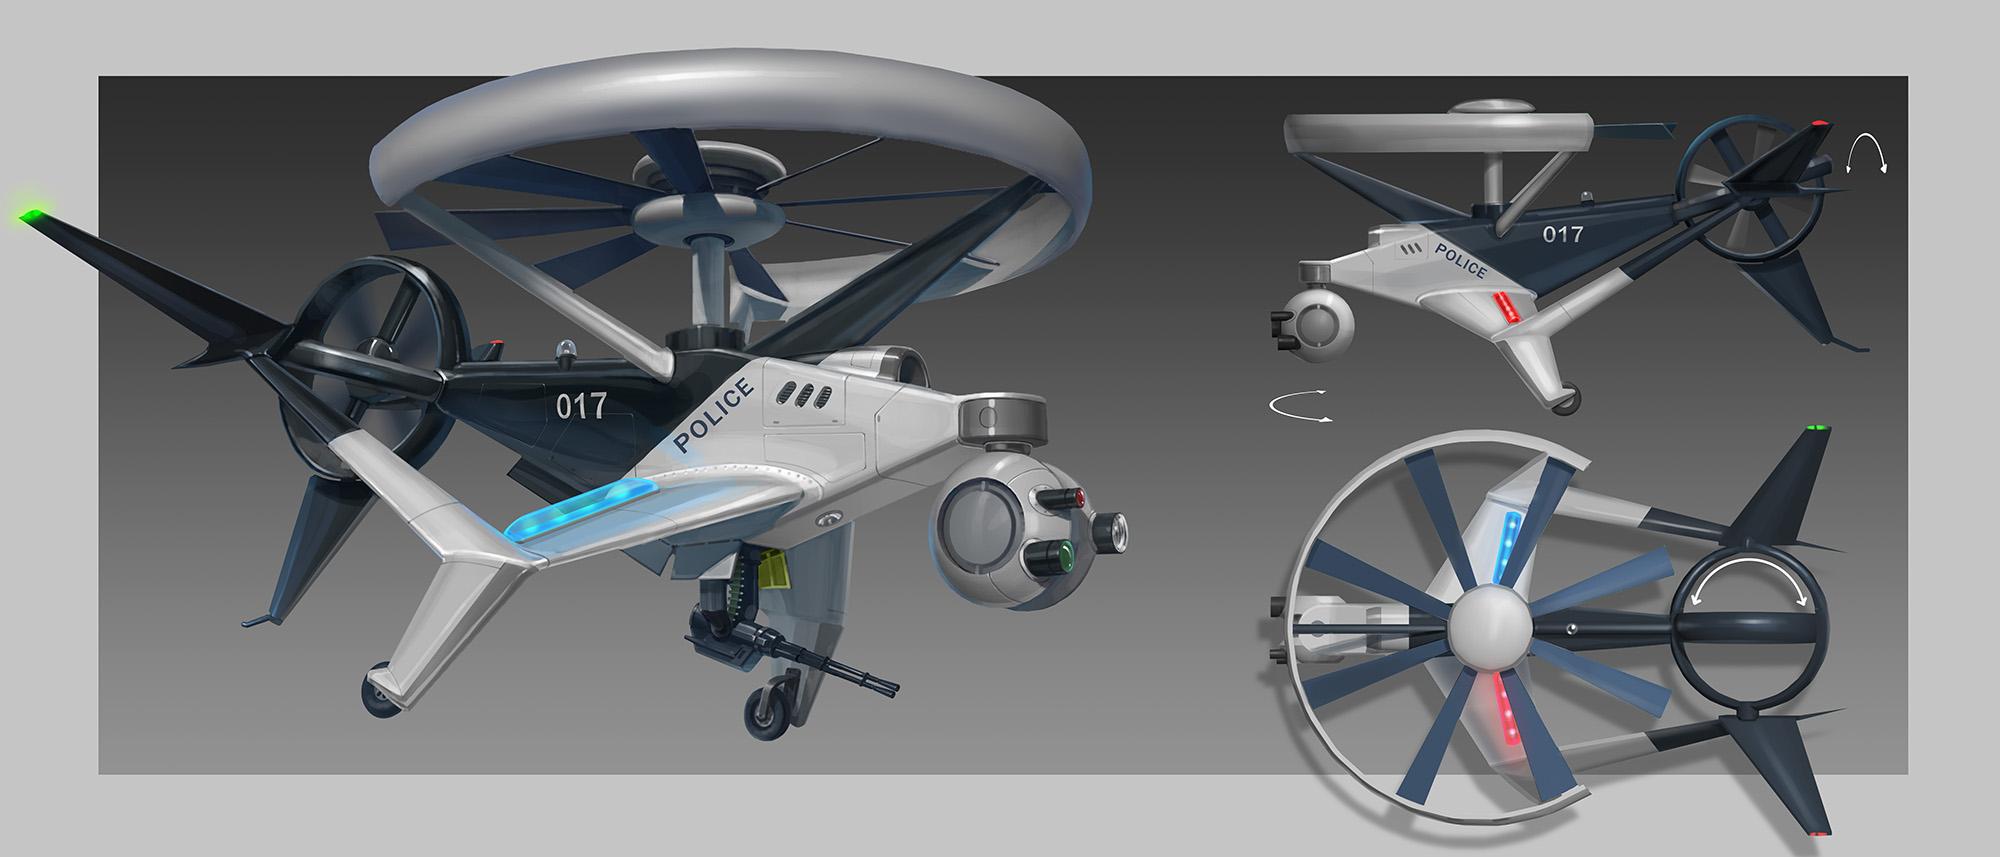 Drone_paint_2000.jpg